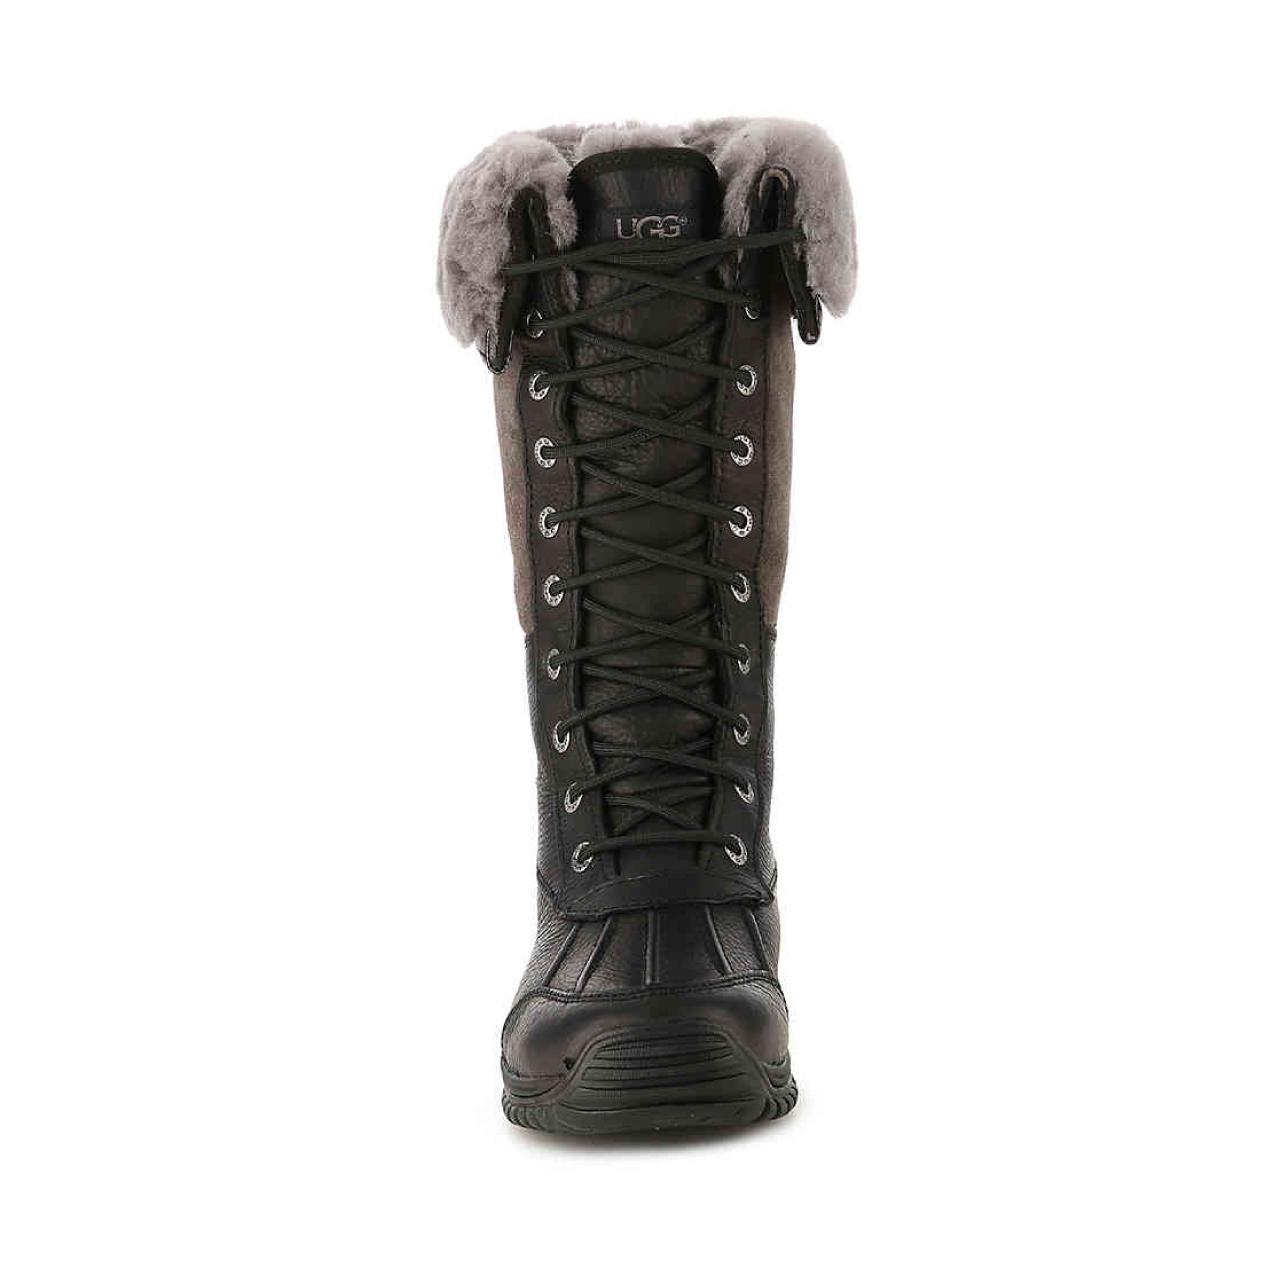 Ugg Adirondack Tall Black Gray Winter Snow Boots Womens